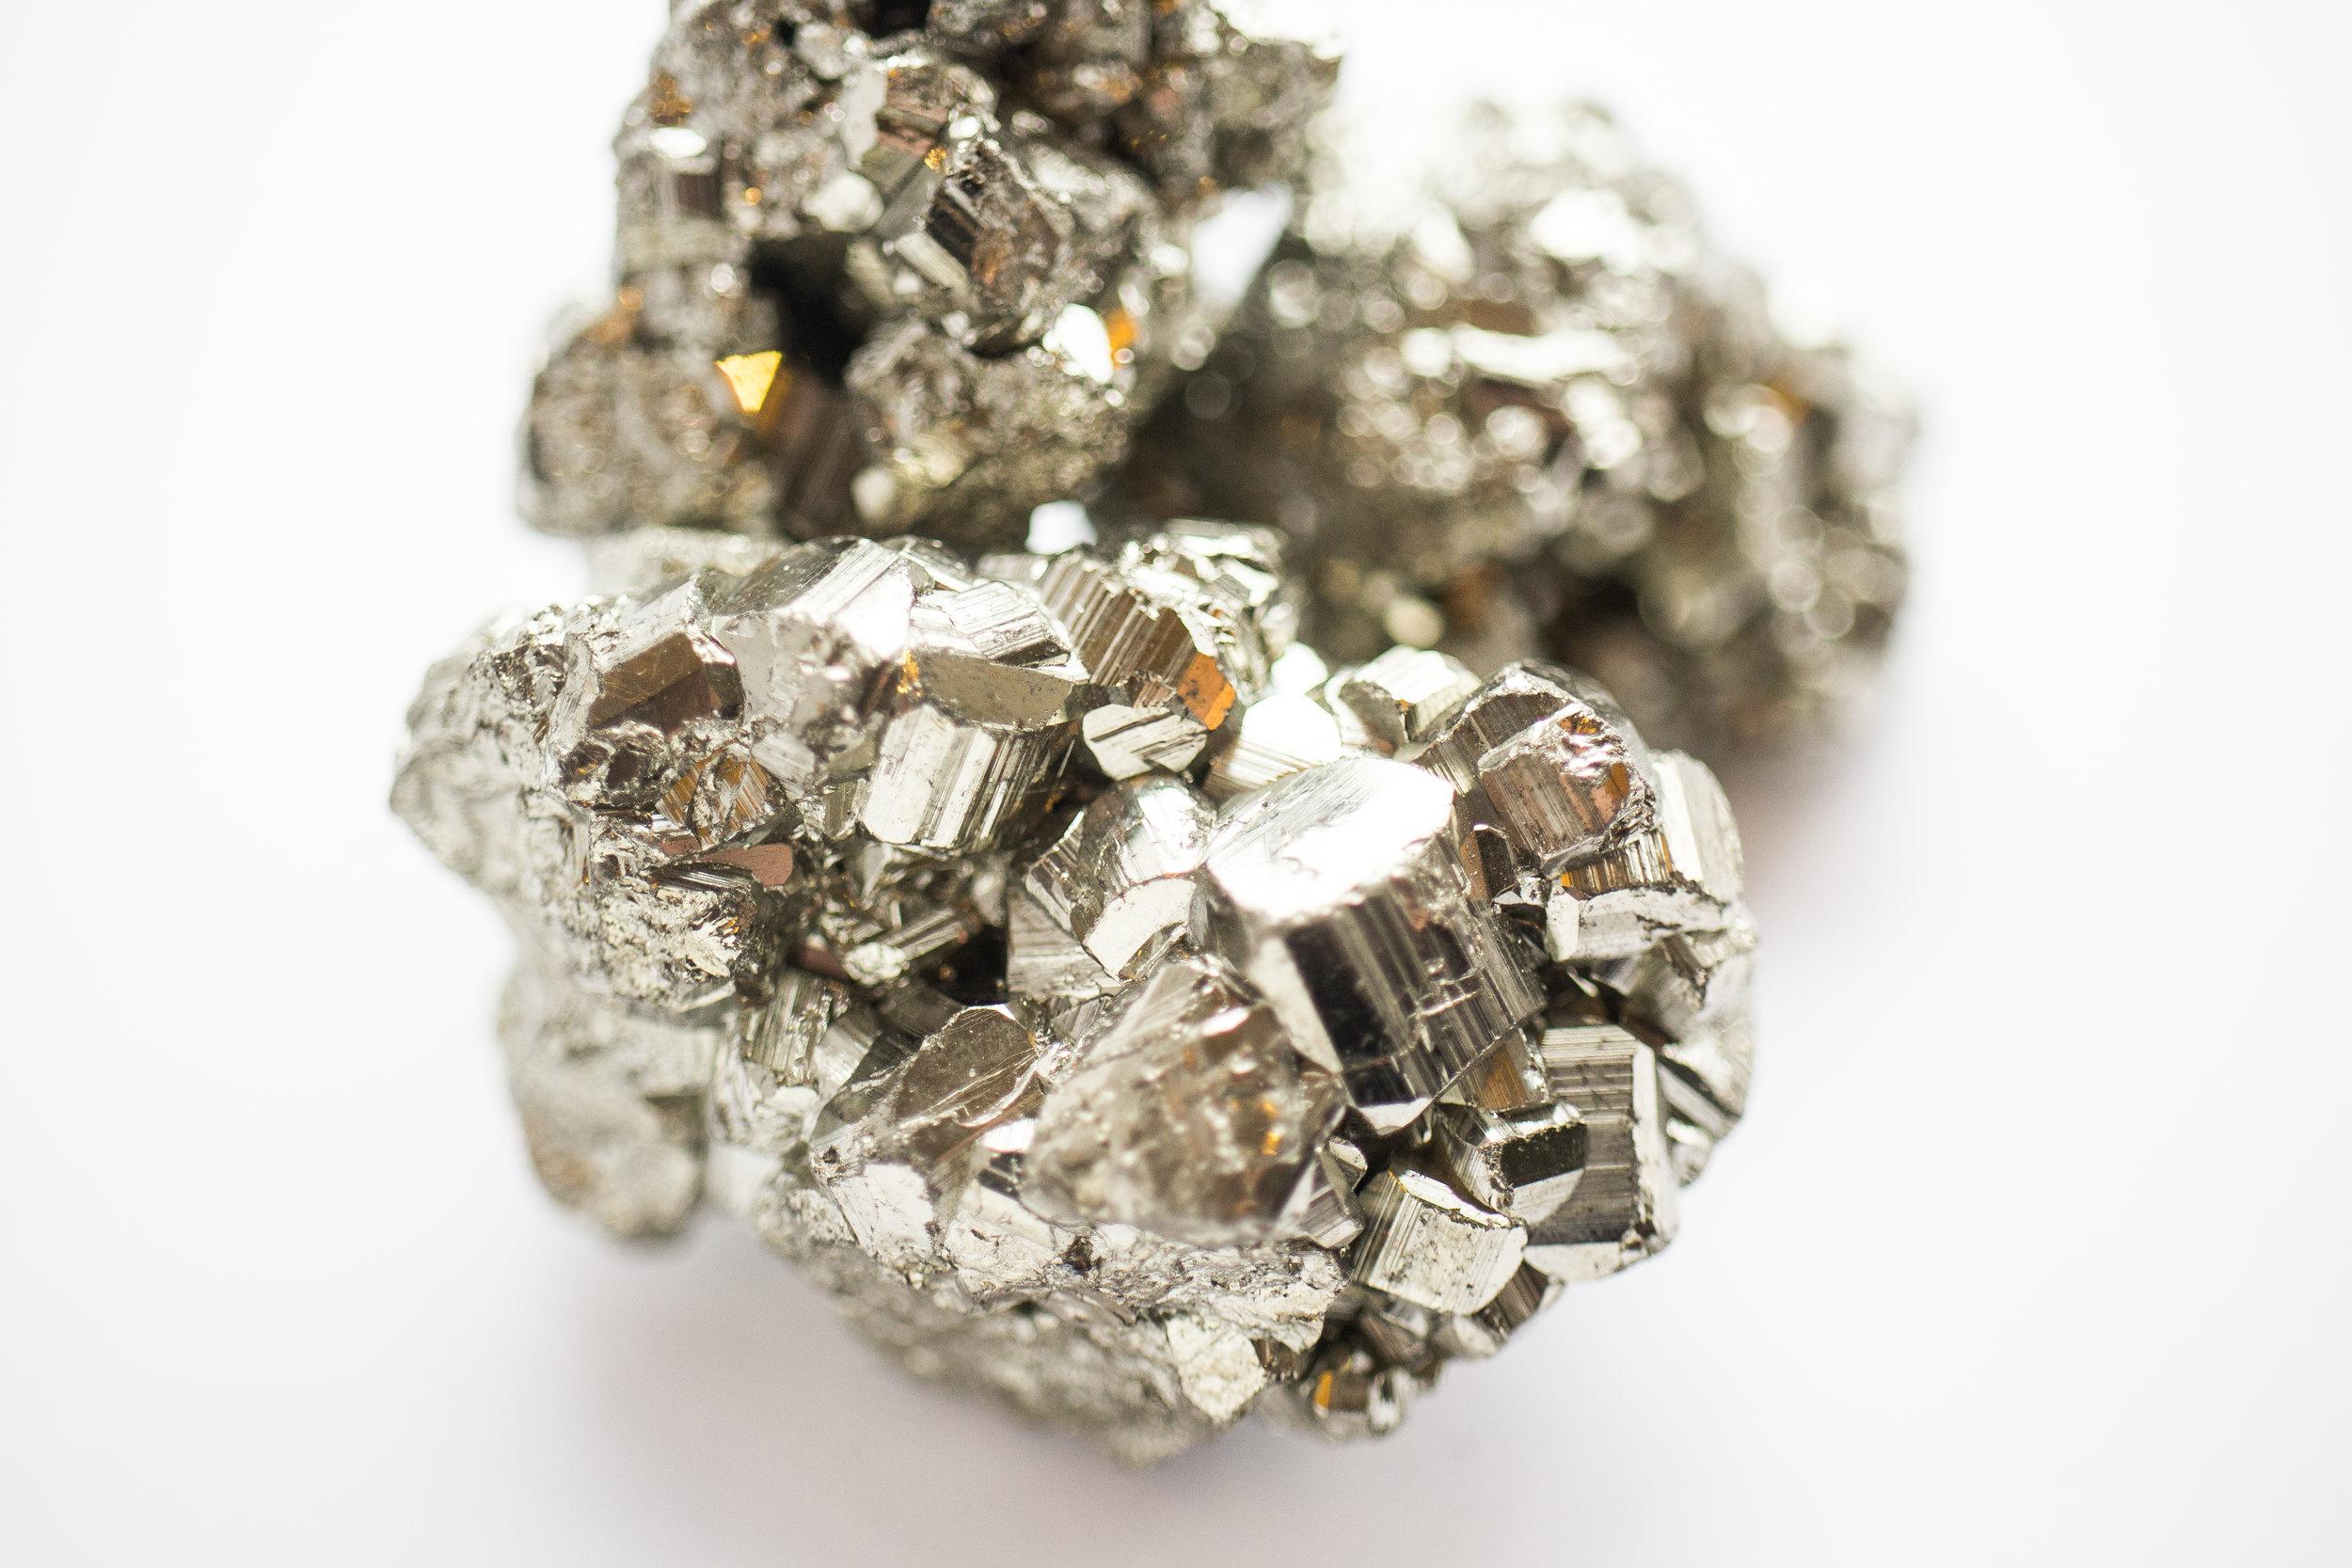 Mallots-LauraOlsen-6882-Pyrite.JPG